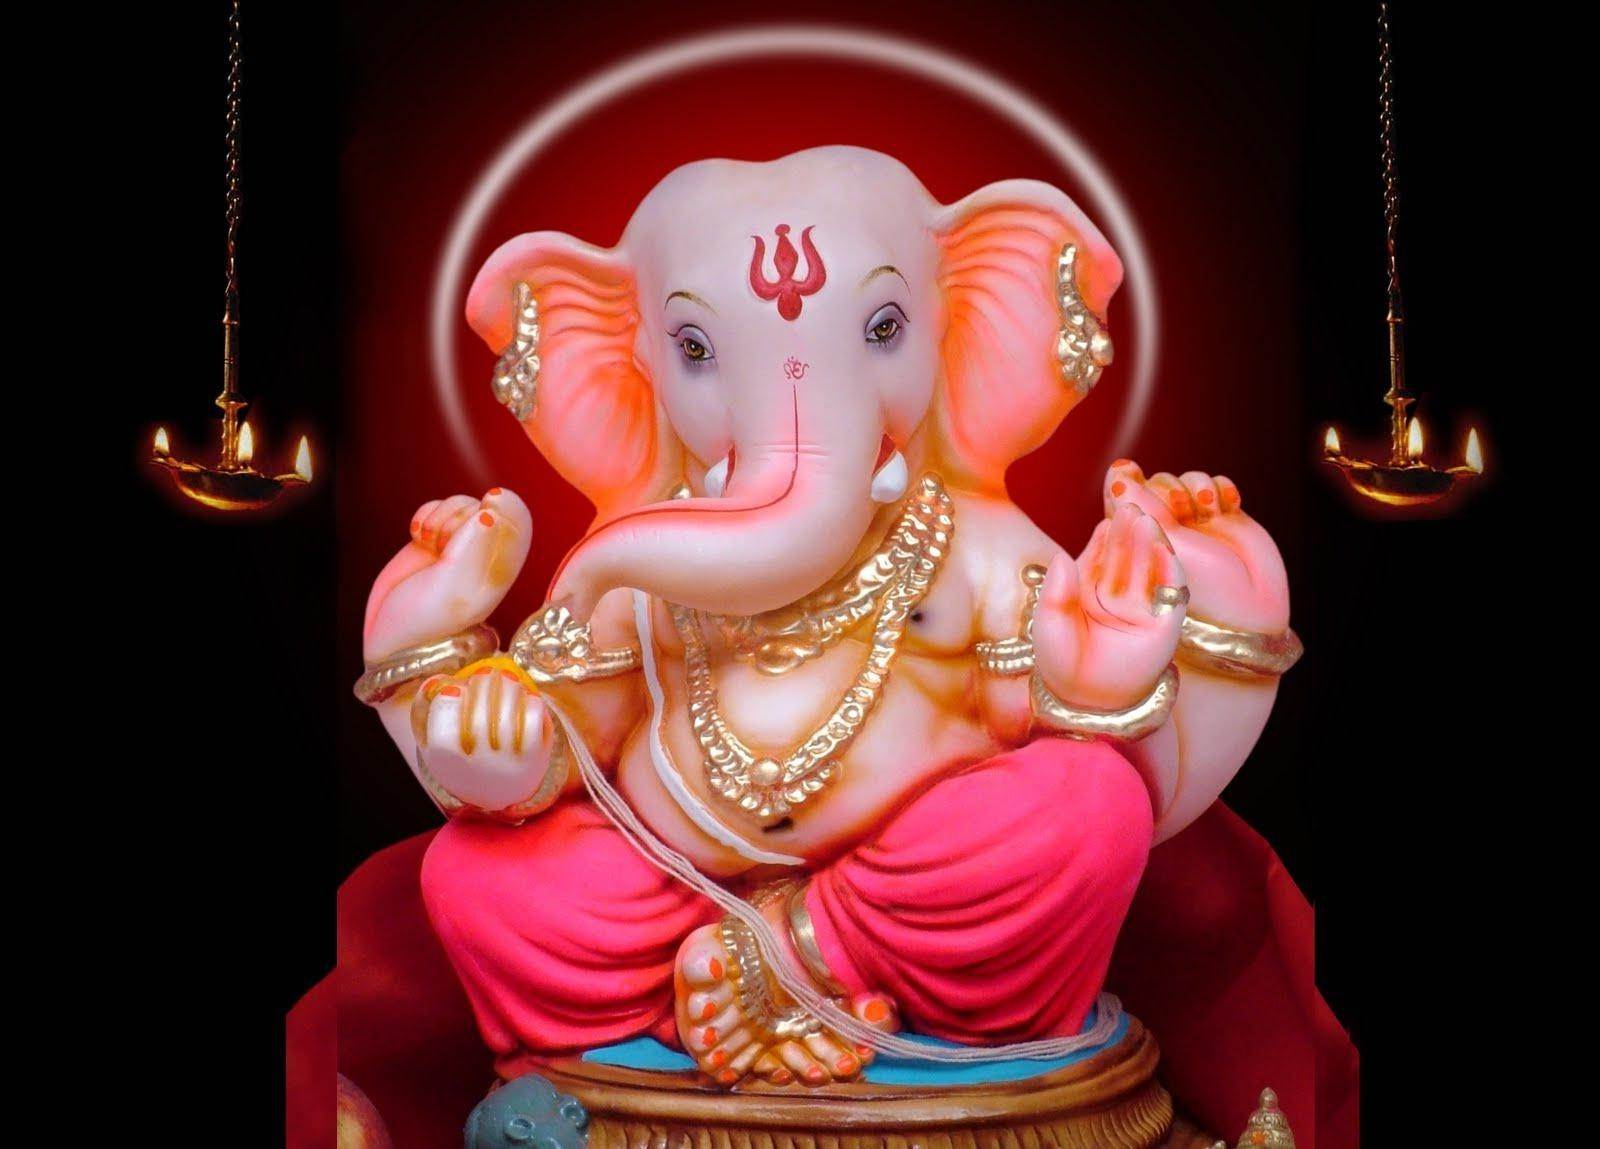 Hình nền HD 1600x1149 Ganpati Bappa Morya Backgrond